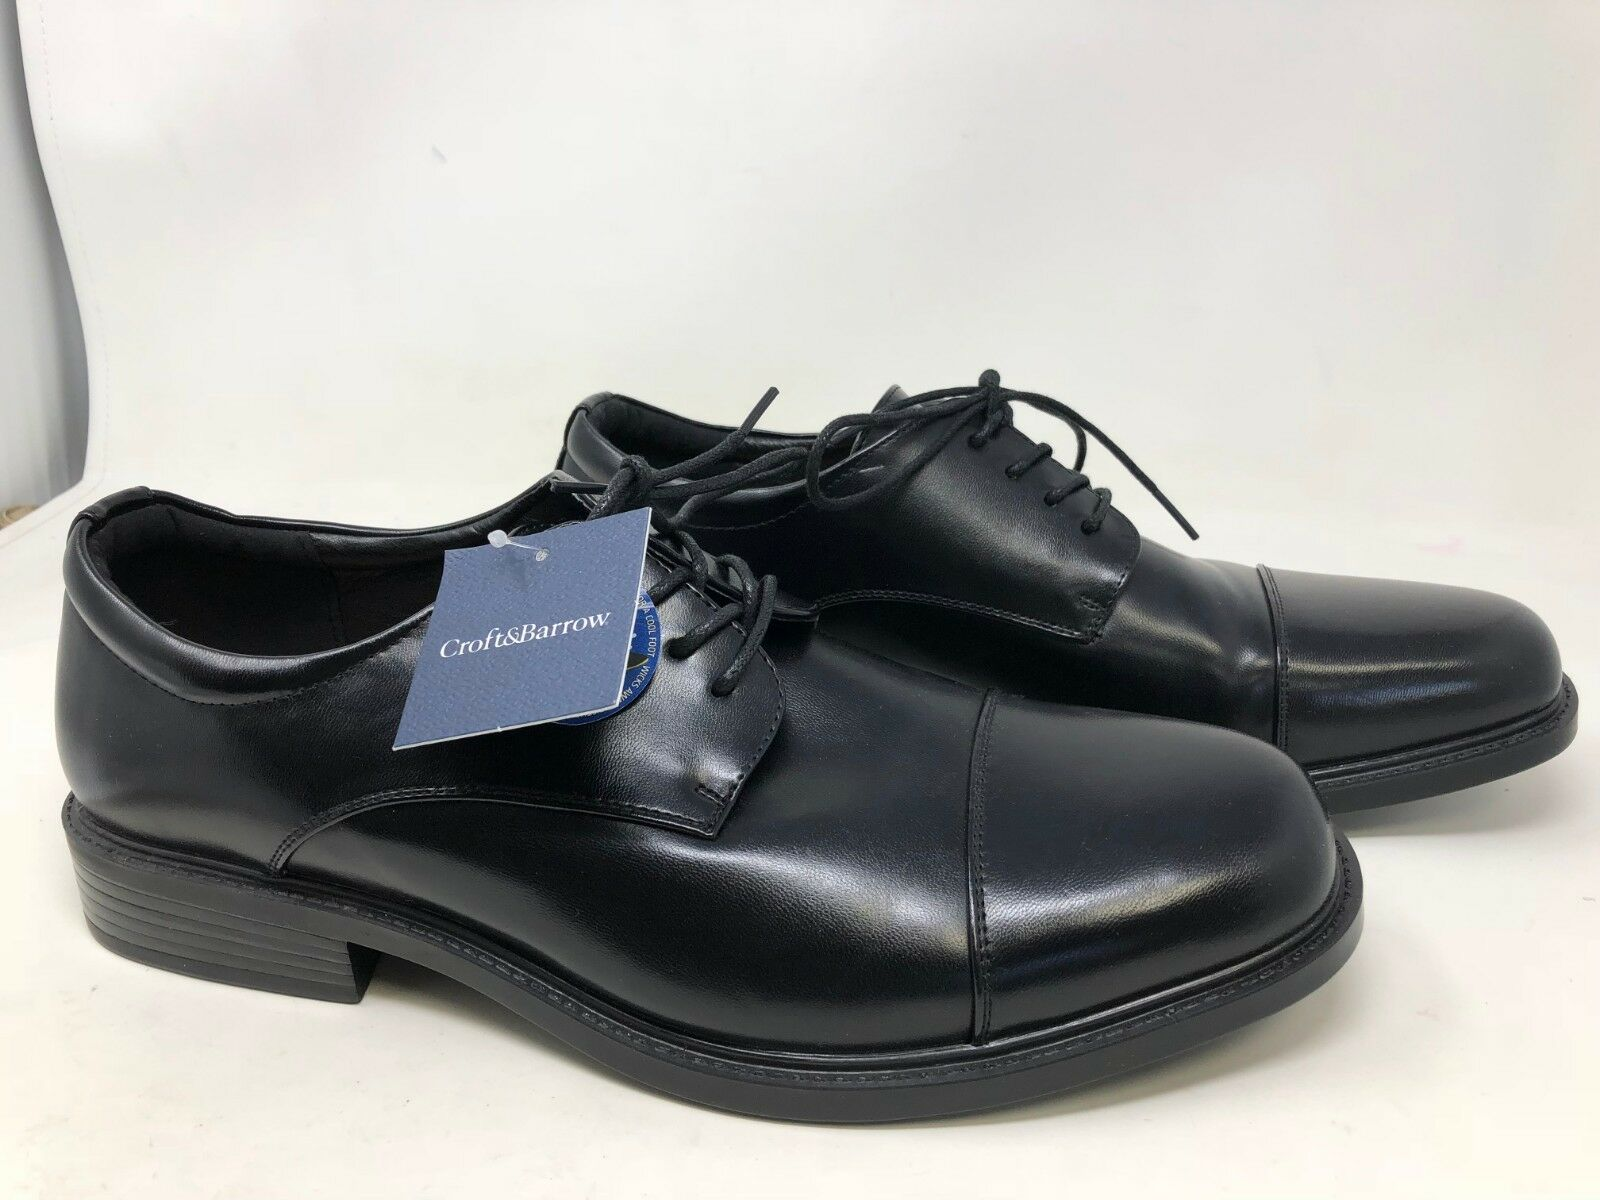 New   Mens Croft & Barrow Affleck Dress shoes Black 119701 3O